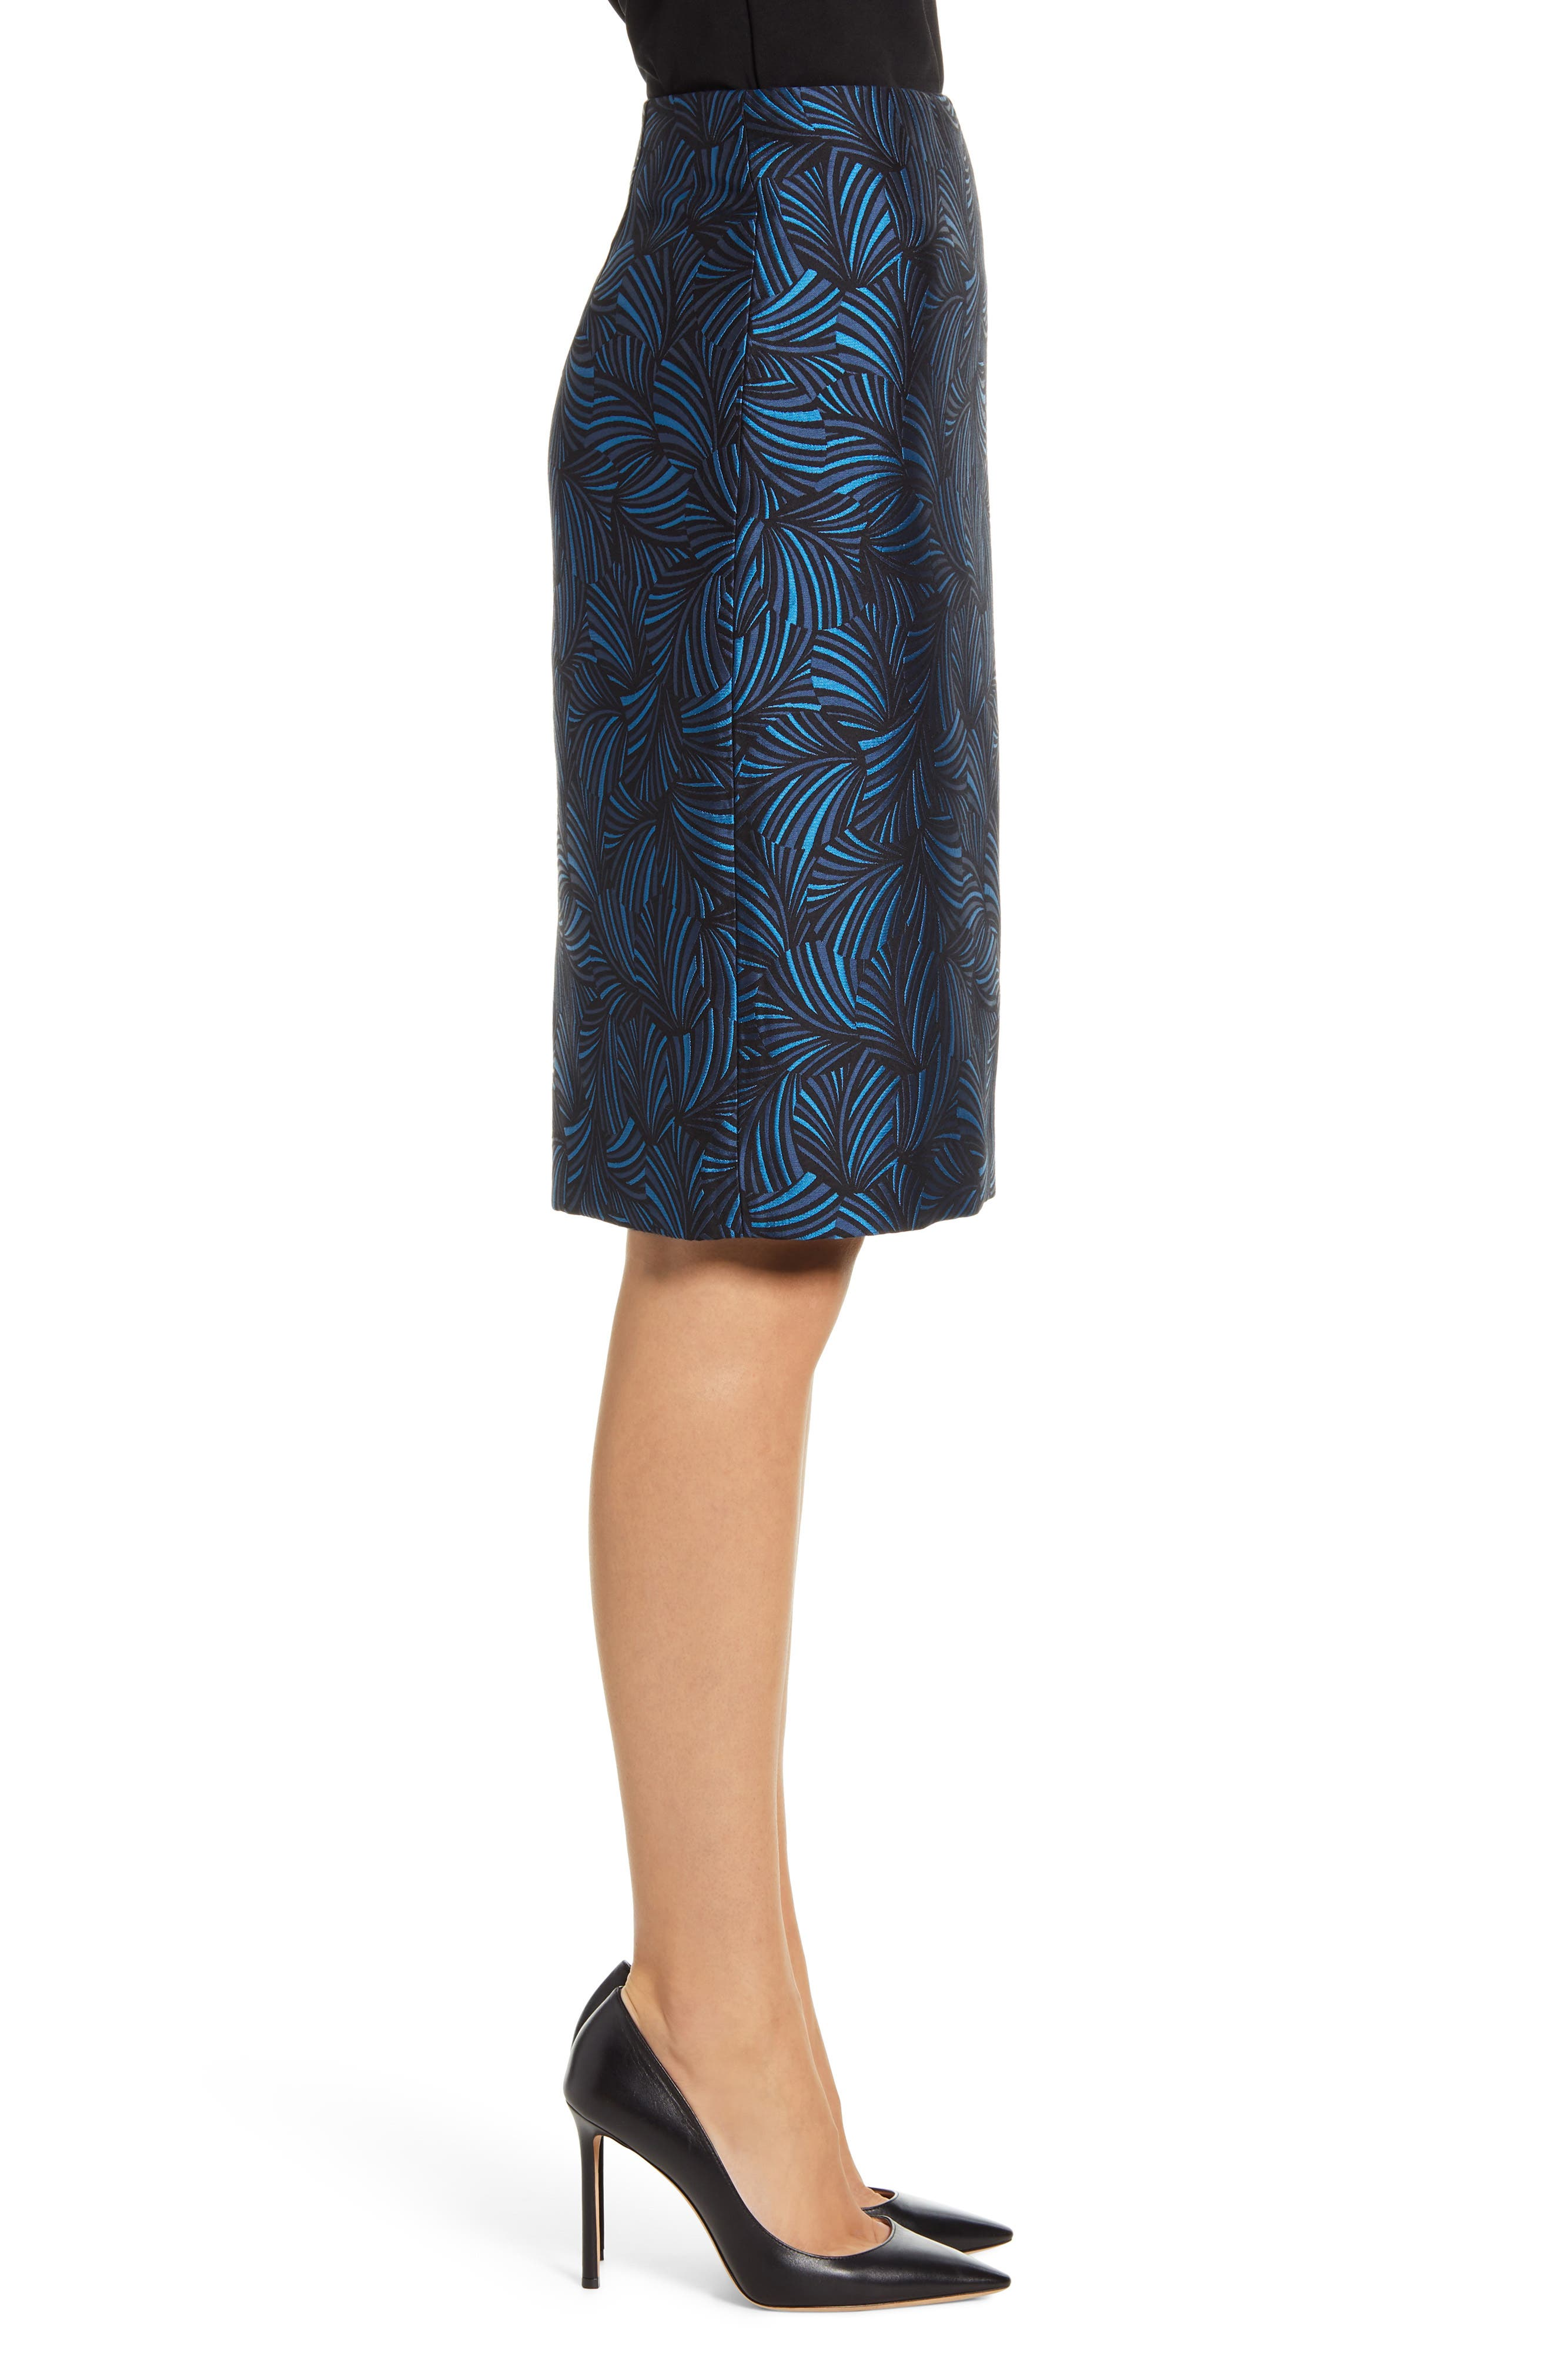 Anne Klein Skirts Jacquard Pencil Skirt